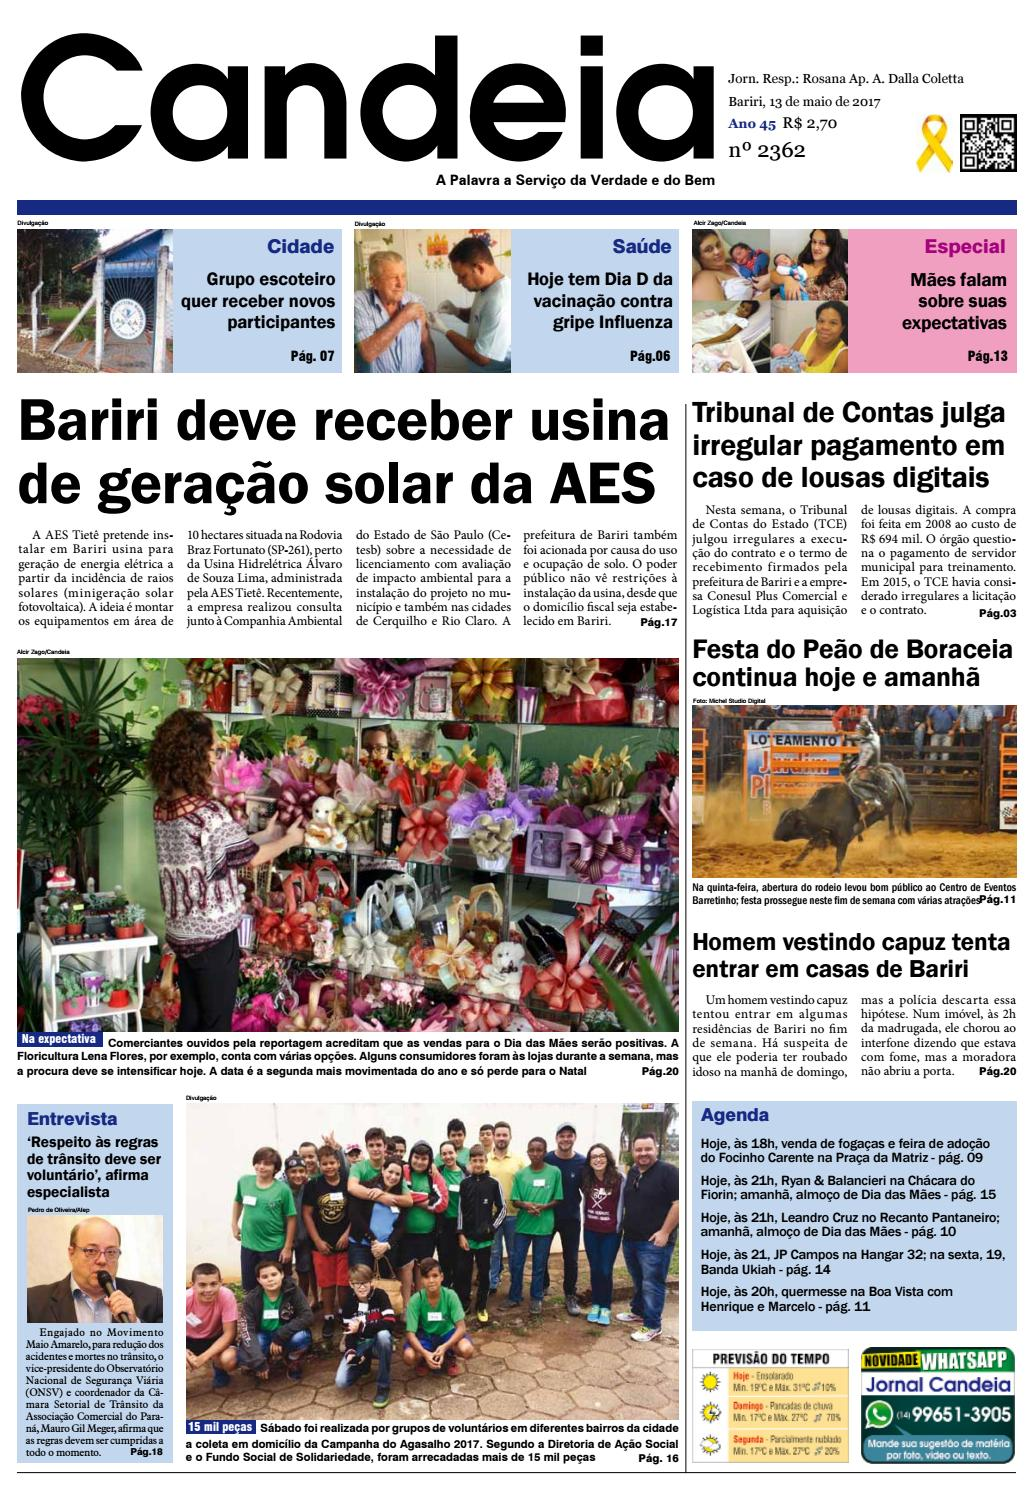 7f4eb3aaa0 Jornal candeia 13 05 2017 by Jornal Candeia - issuu